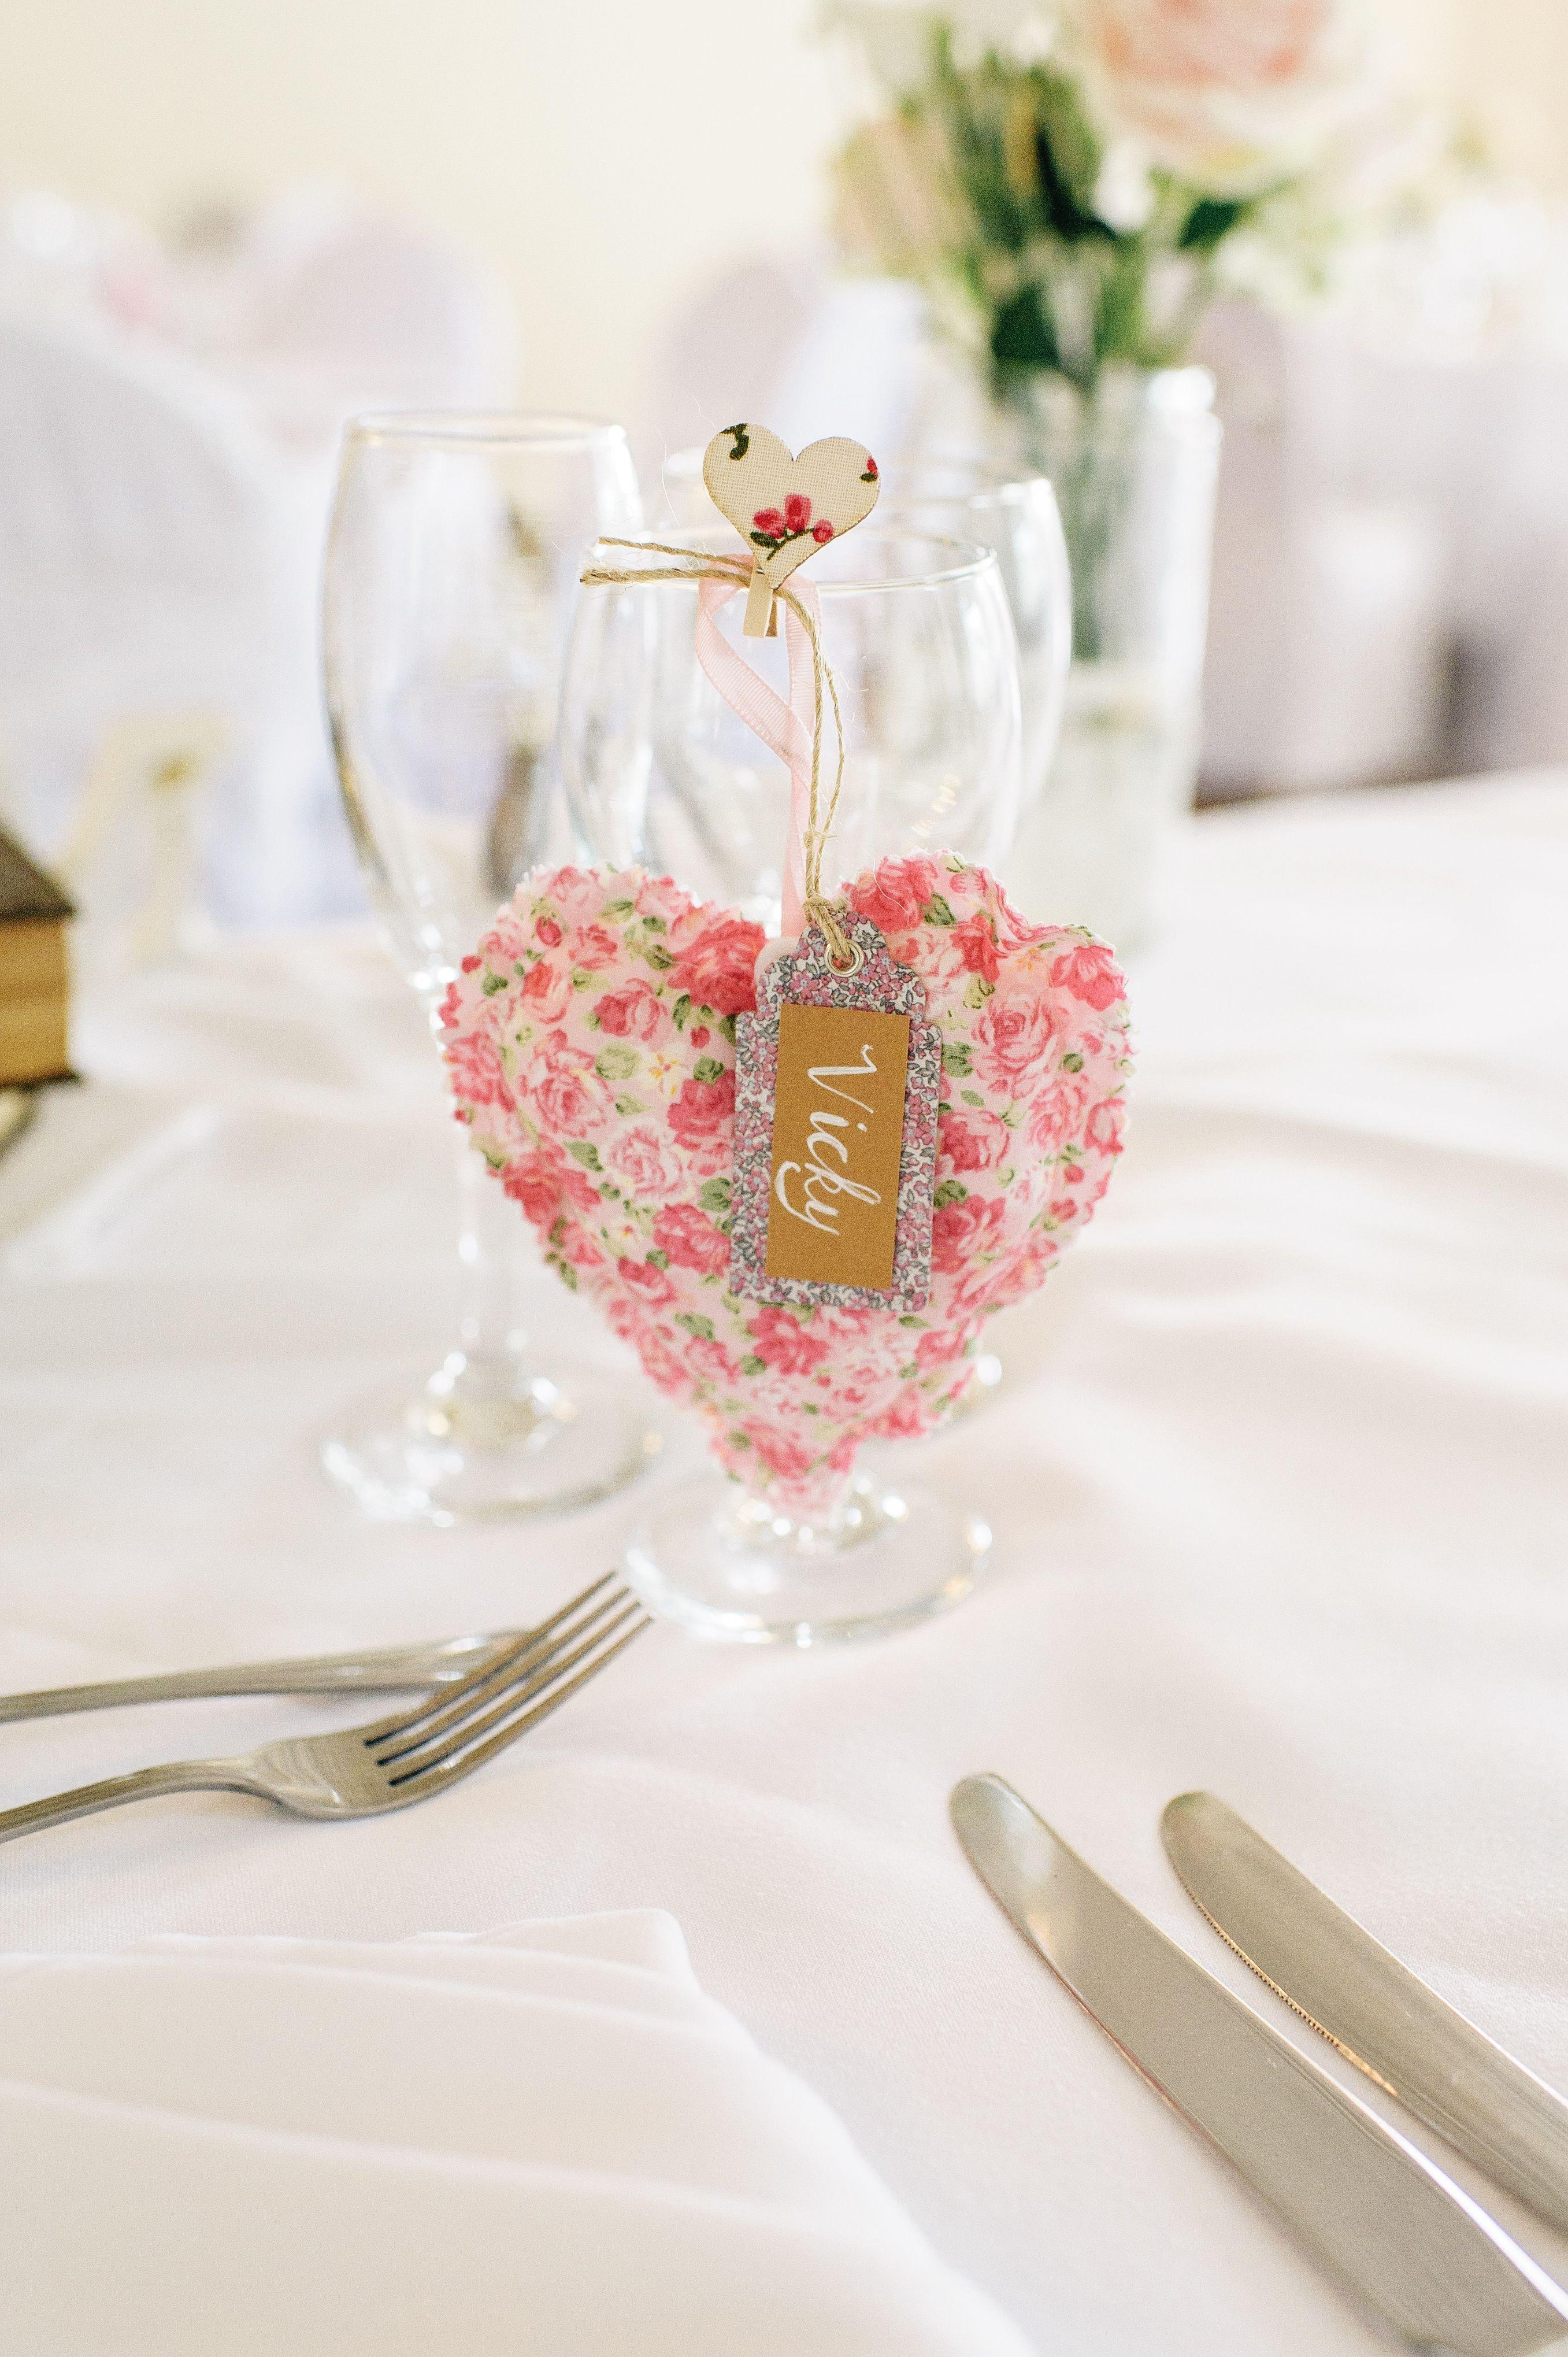 Handmade hanging heart wedding favour from Lauradana Day ...